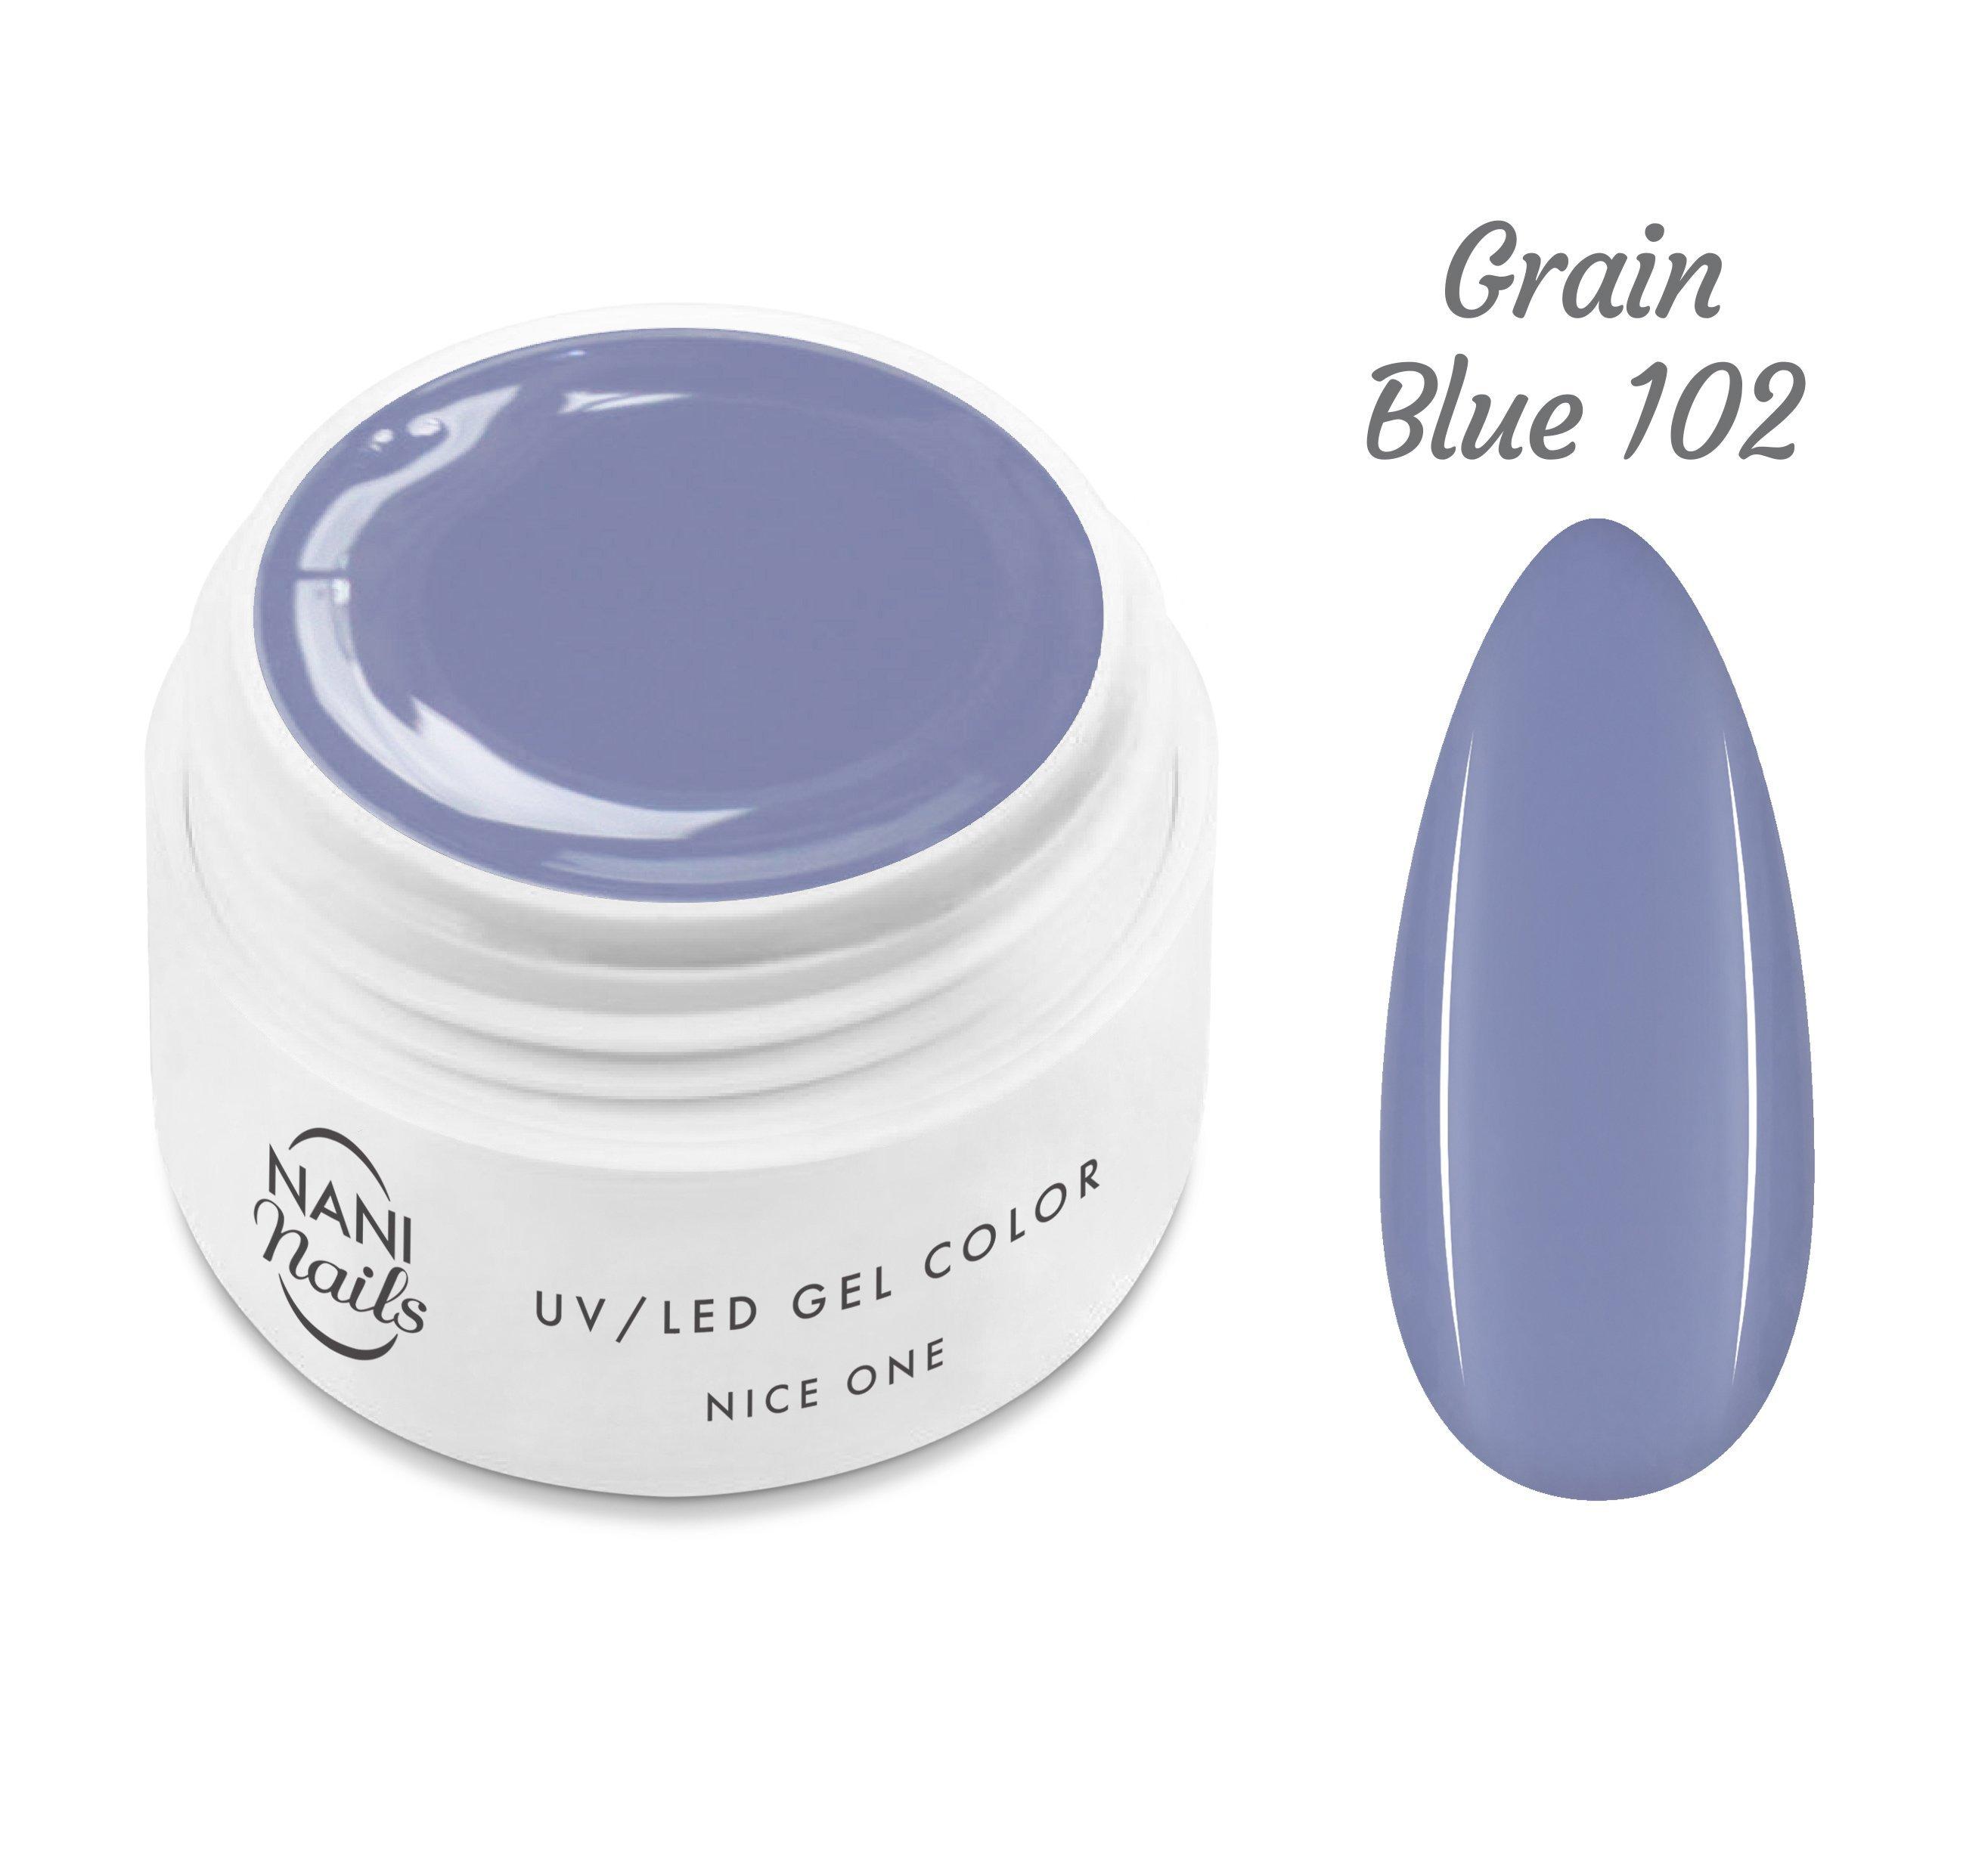 NANI UV gél Nice One Color 5 ml - Grain Blue